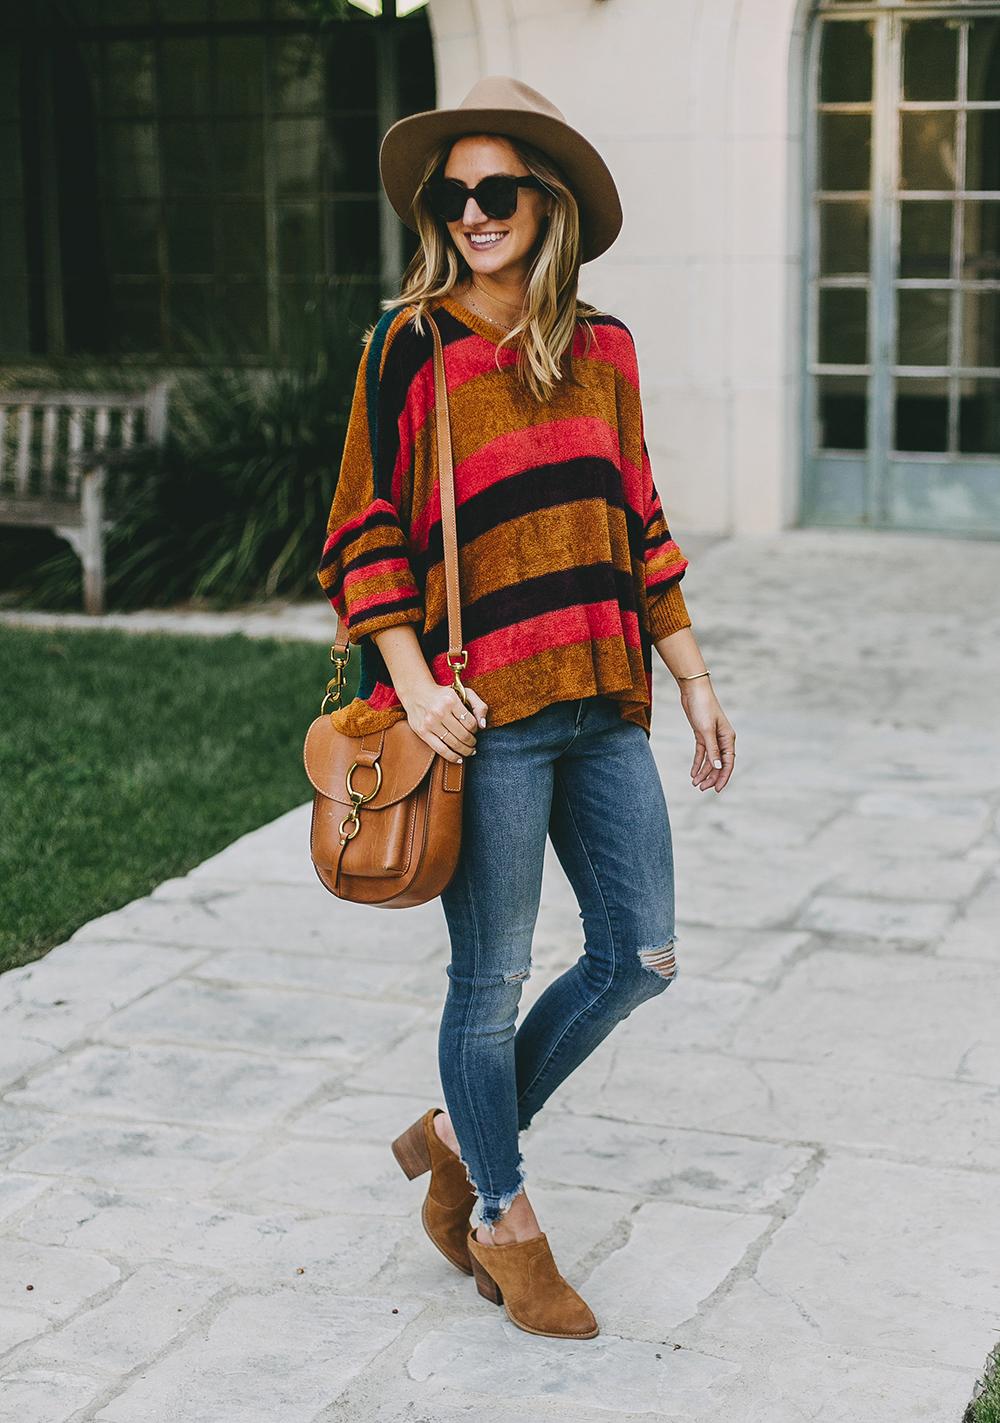 livvyland-blog-olivia-watson-austin-texas-fashion-blogger-free-people-oversize-striped-sweater-boho-chic-4